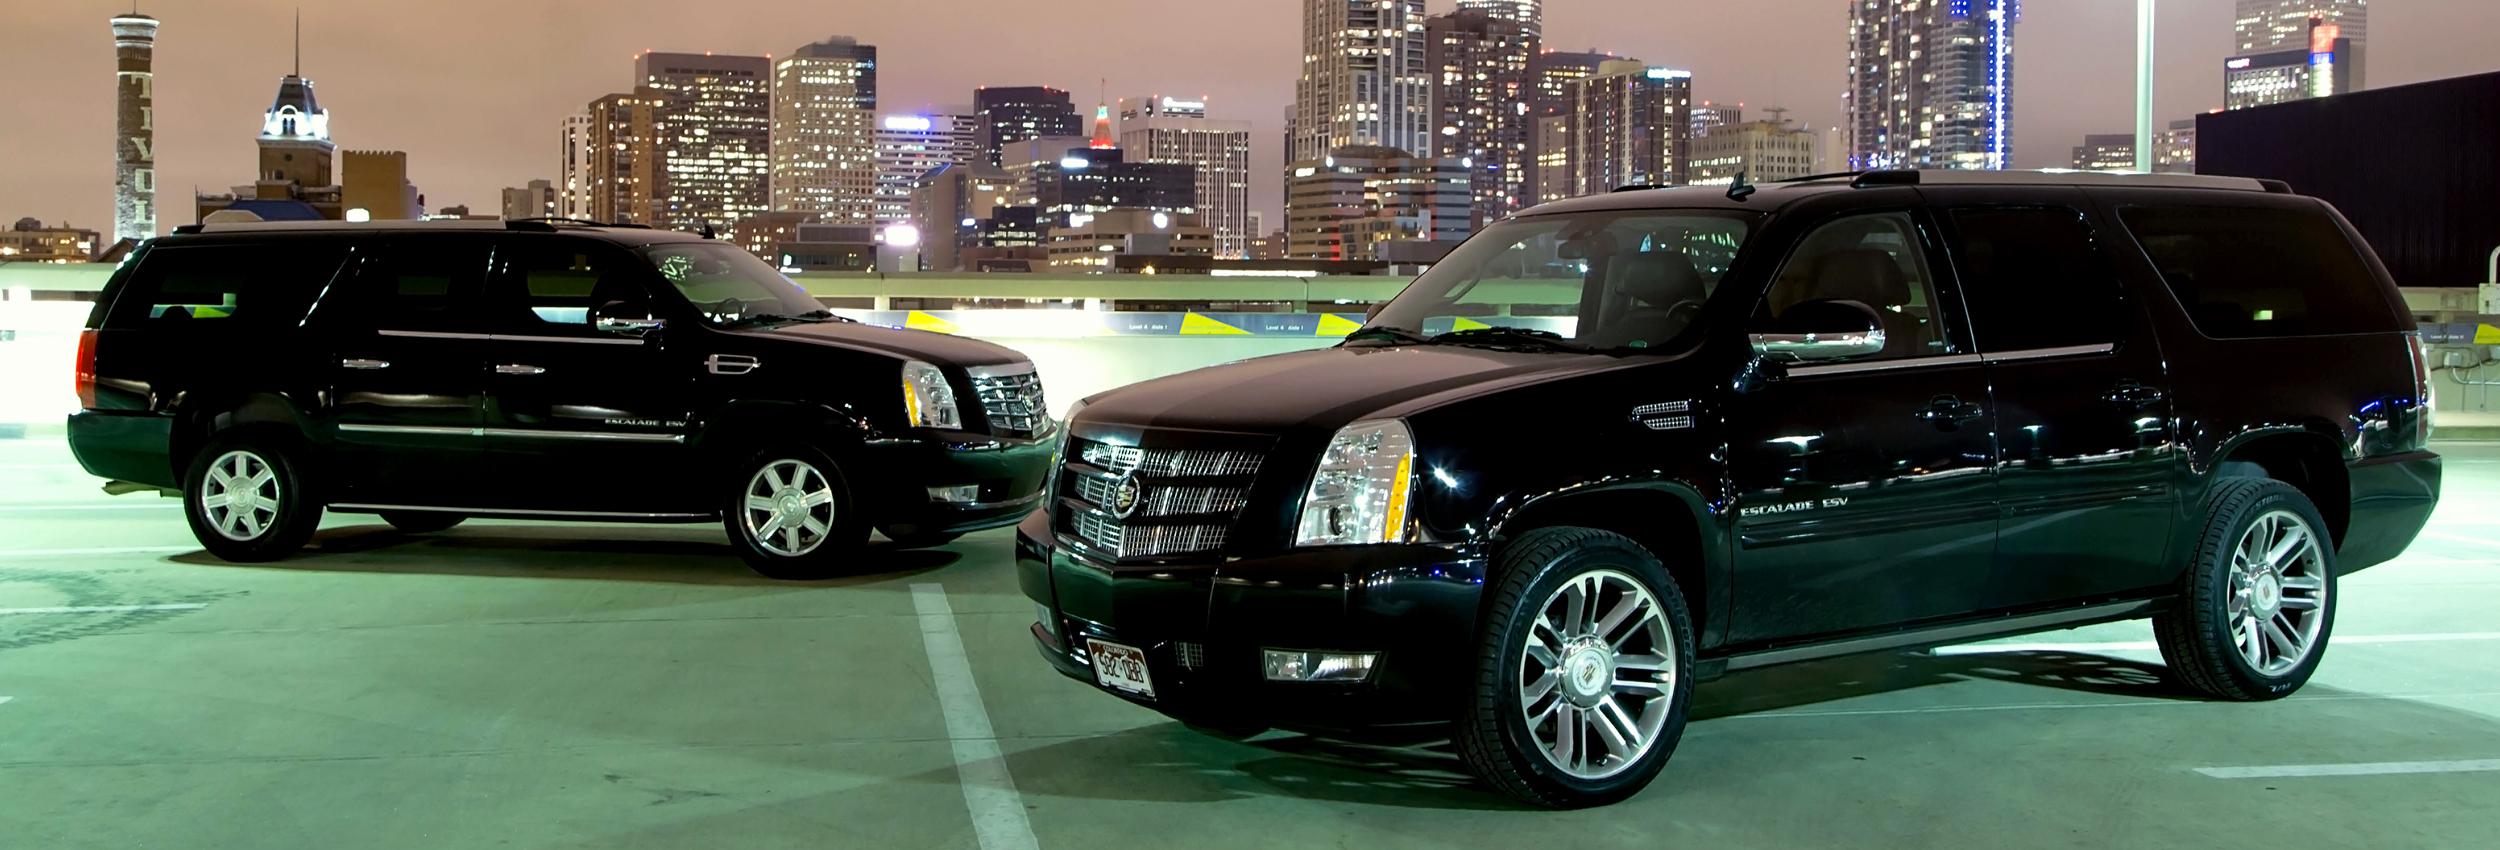 Luxury Car Service Denver Co